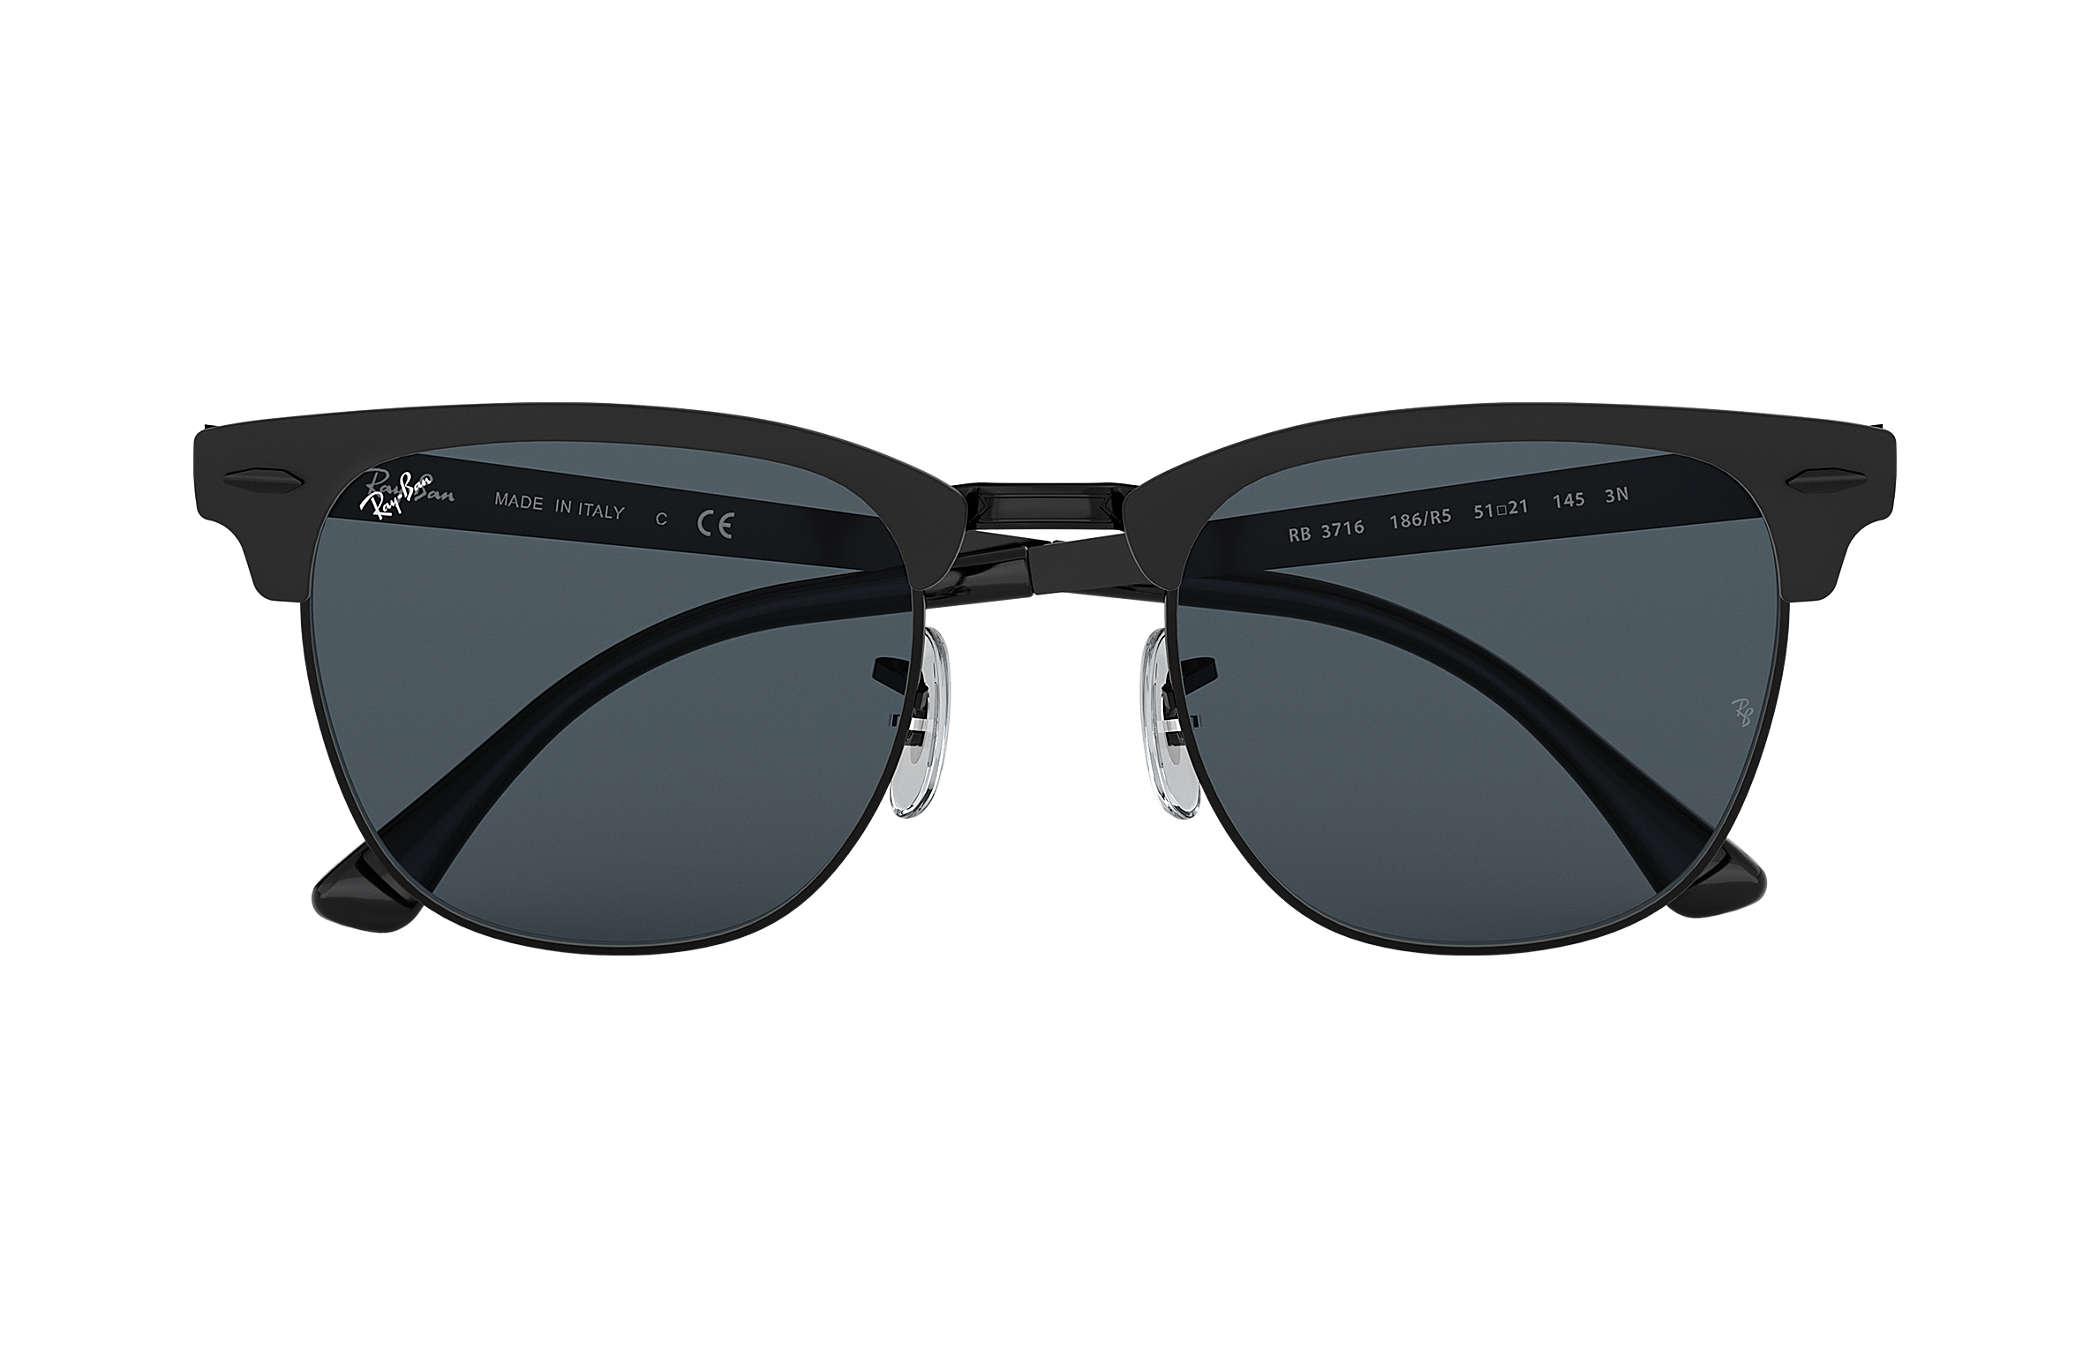 0d32008352 Ray-Ban Clubmaster Metal RB3716 Black - Metal - Blue Lenses ...